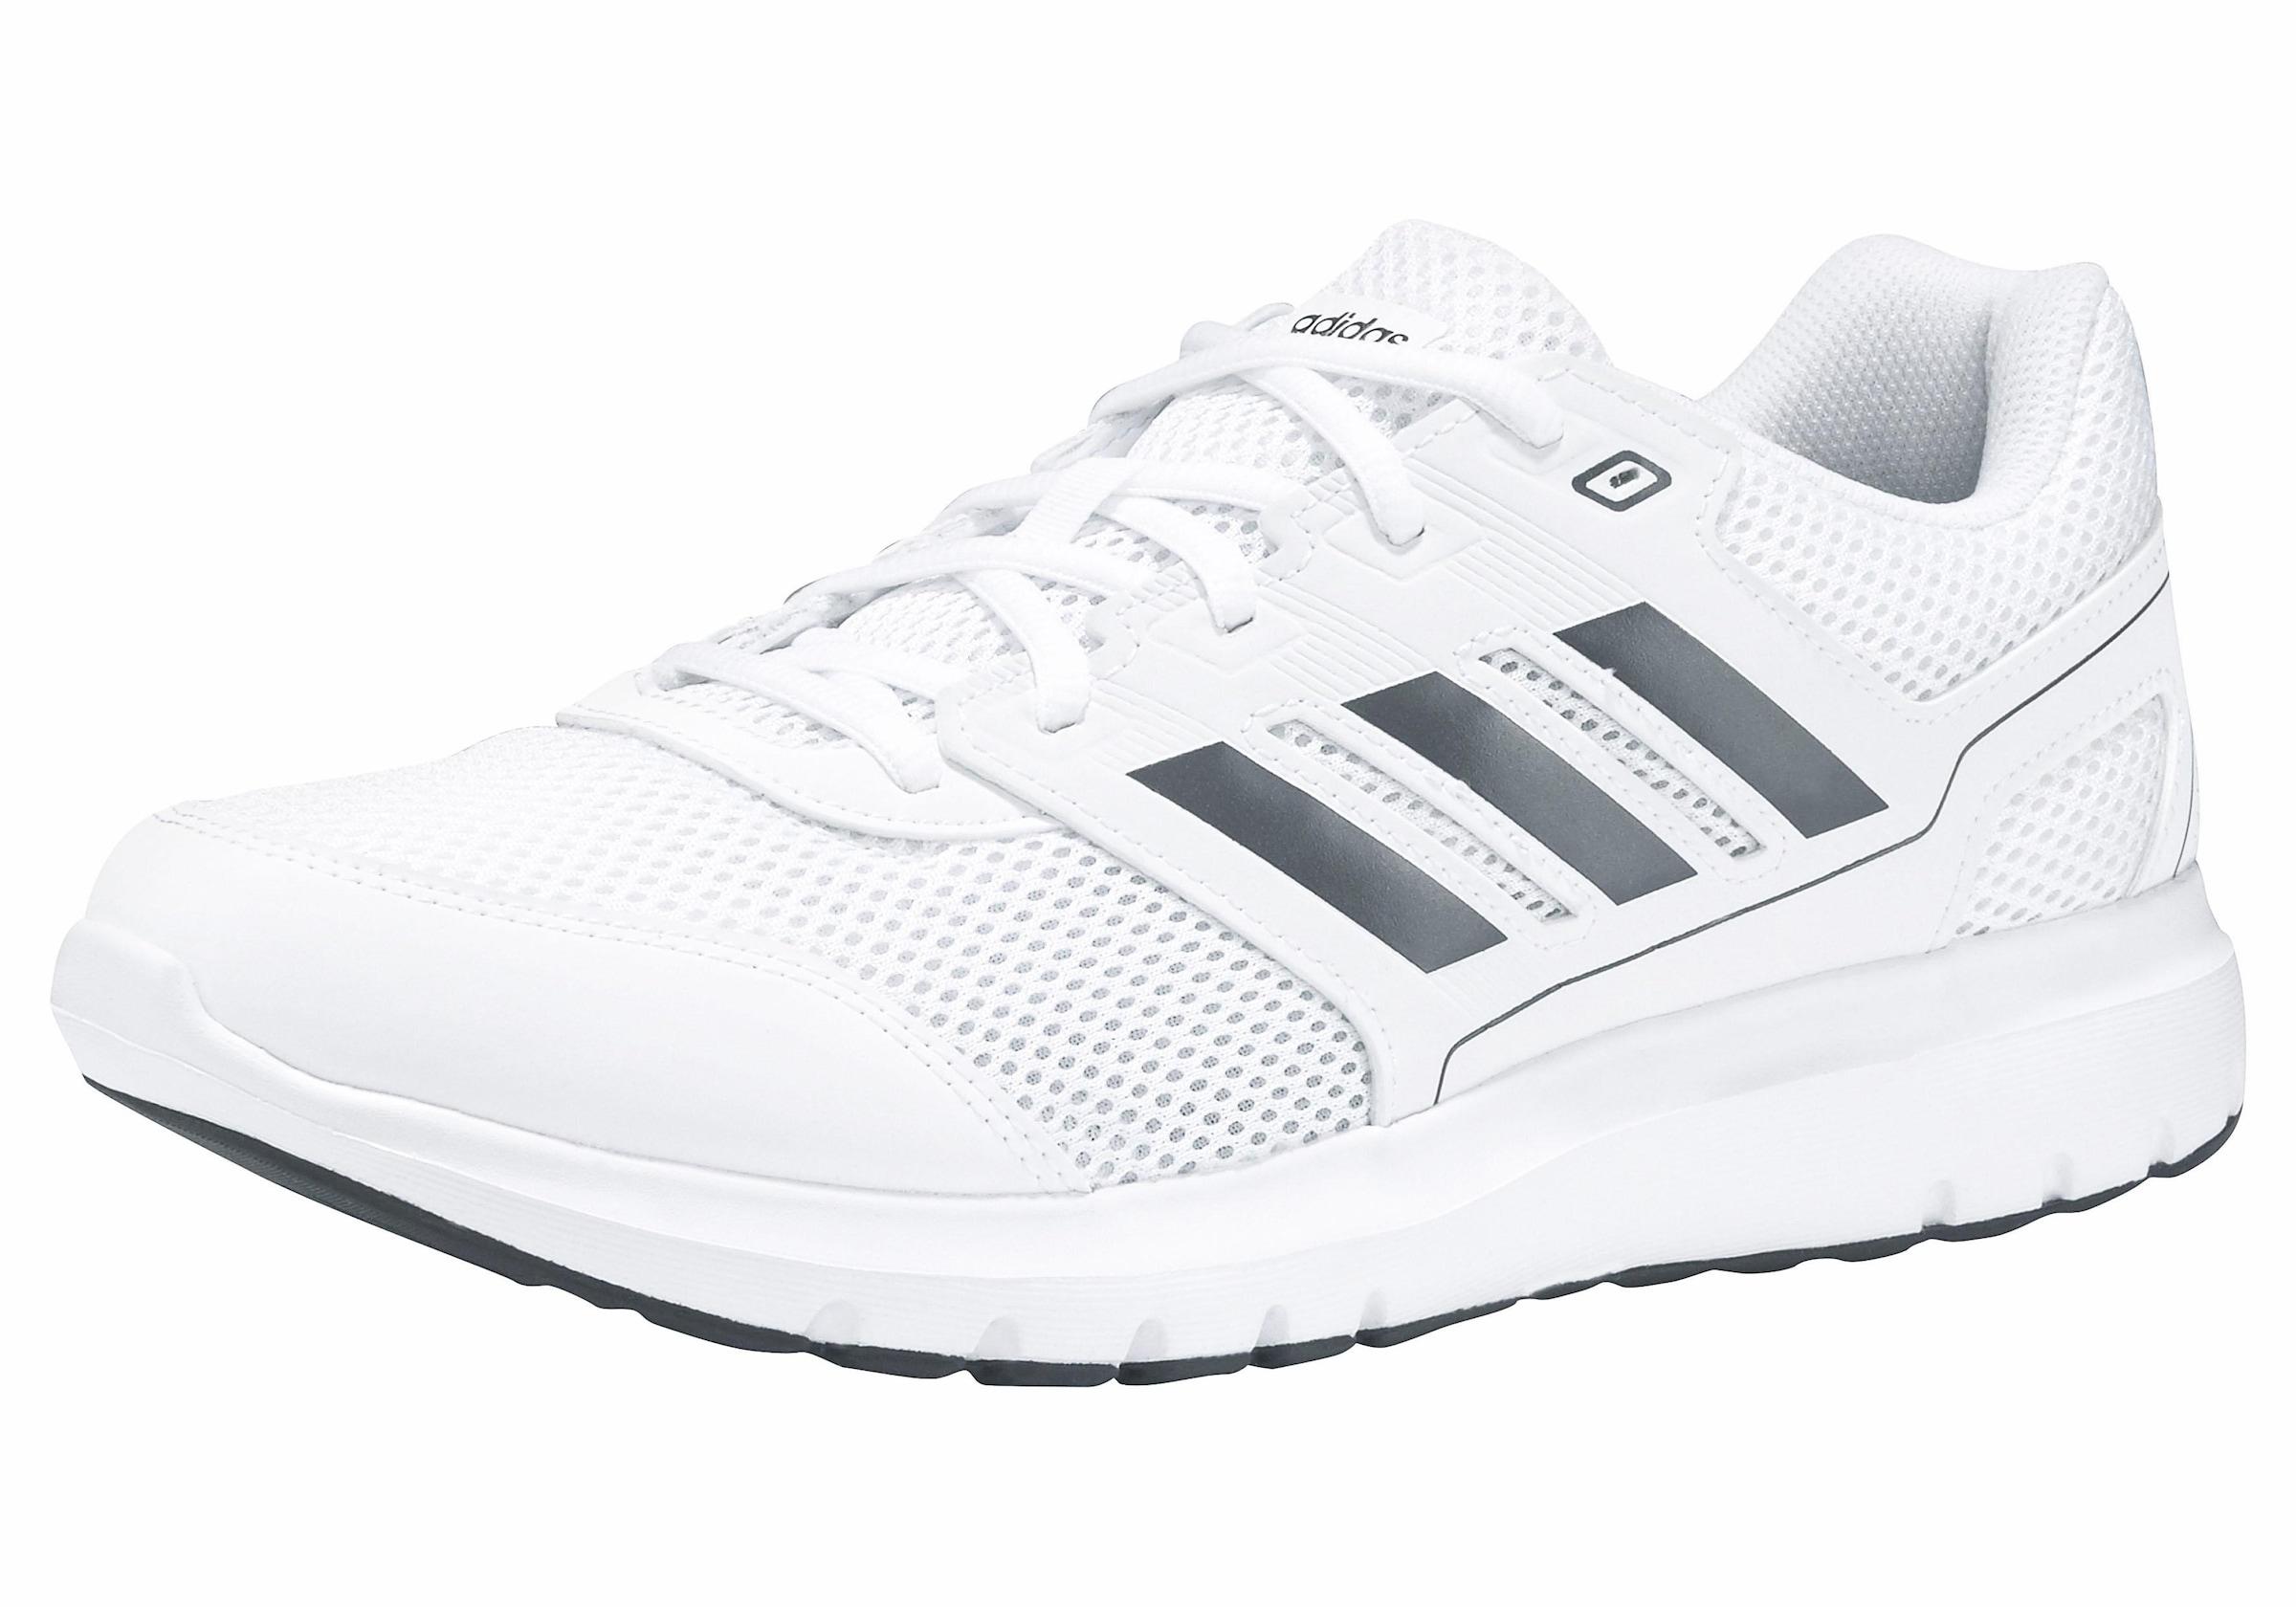 Image of adidas Laufschuh »Duramo Lite 2.0 M«